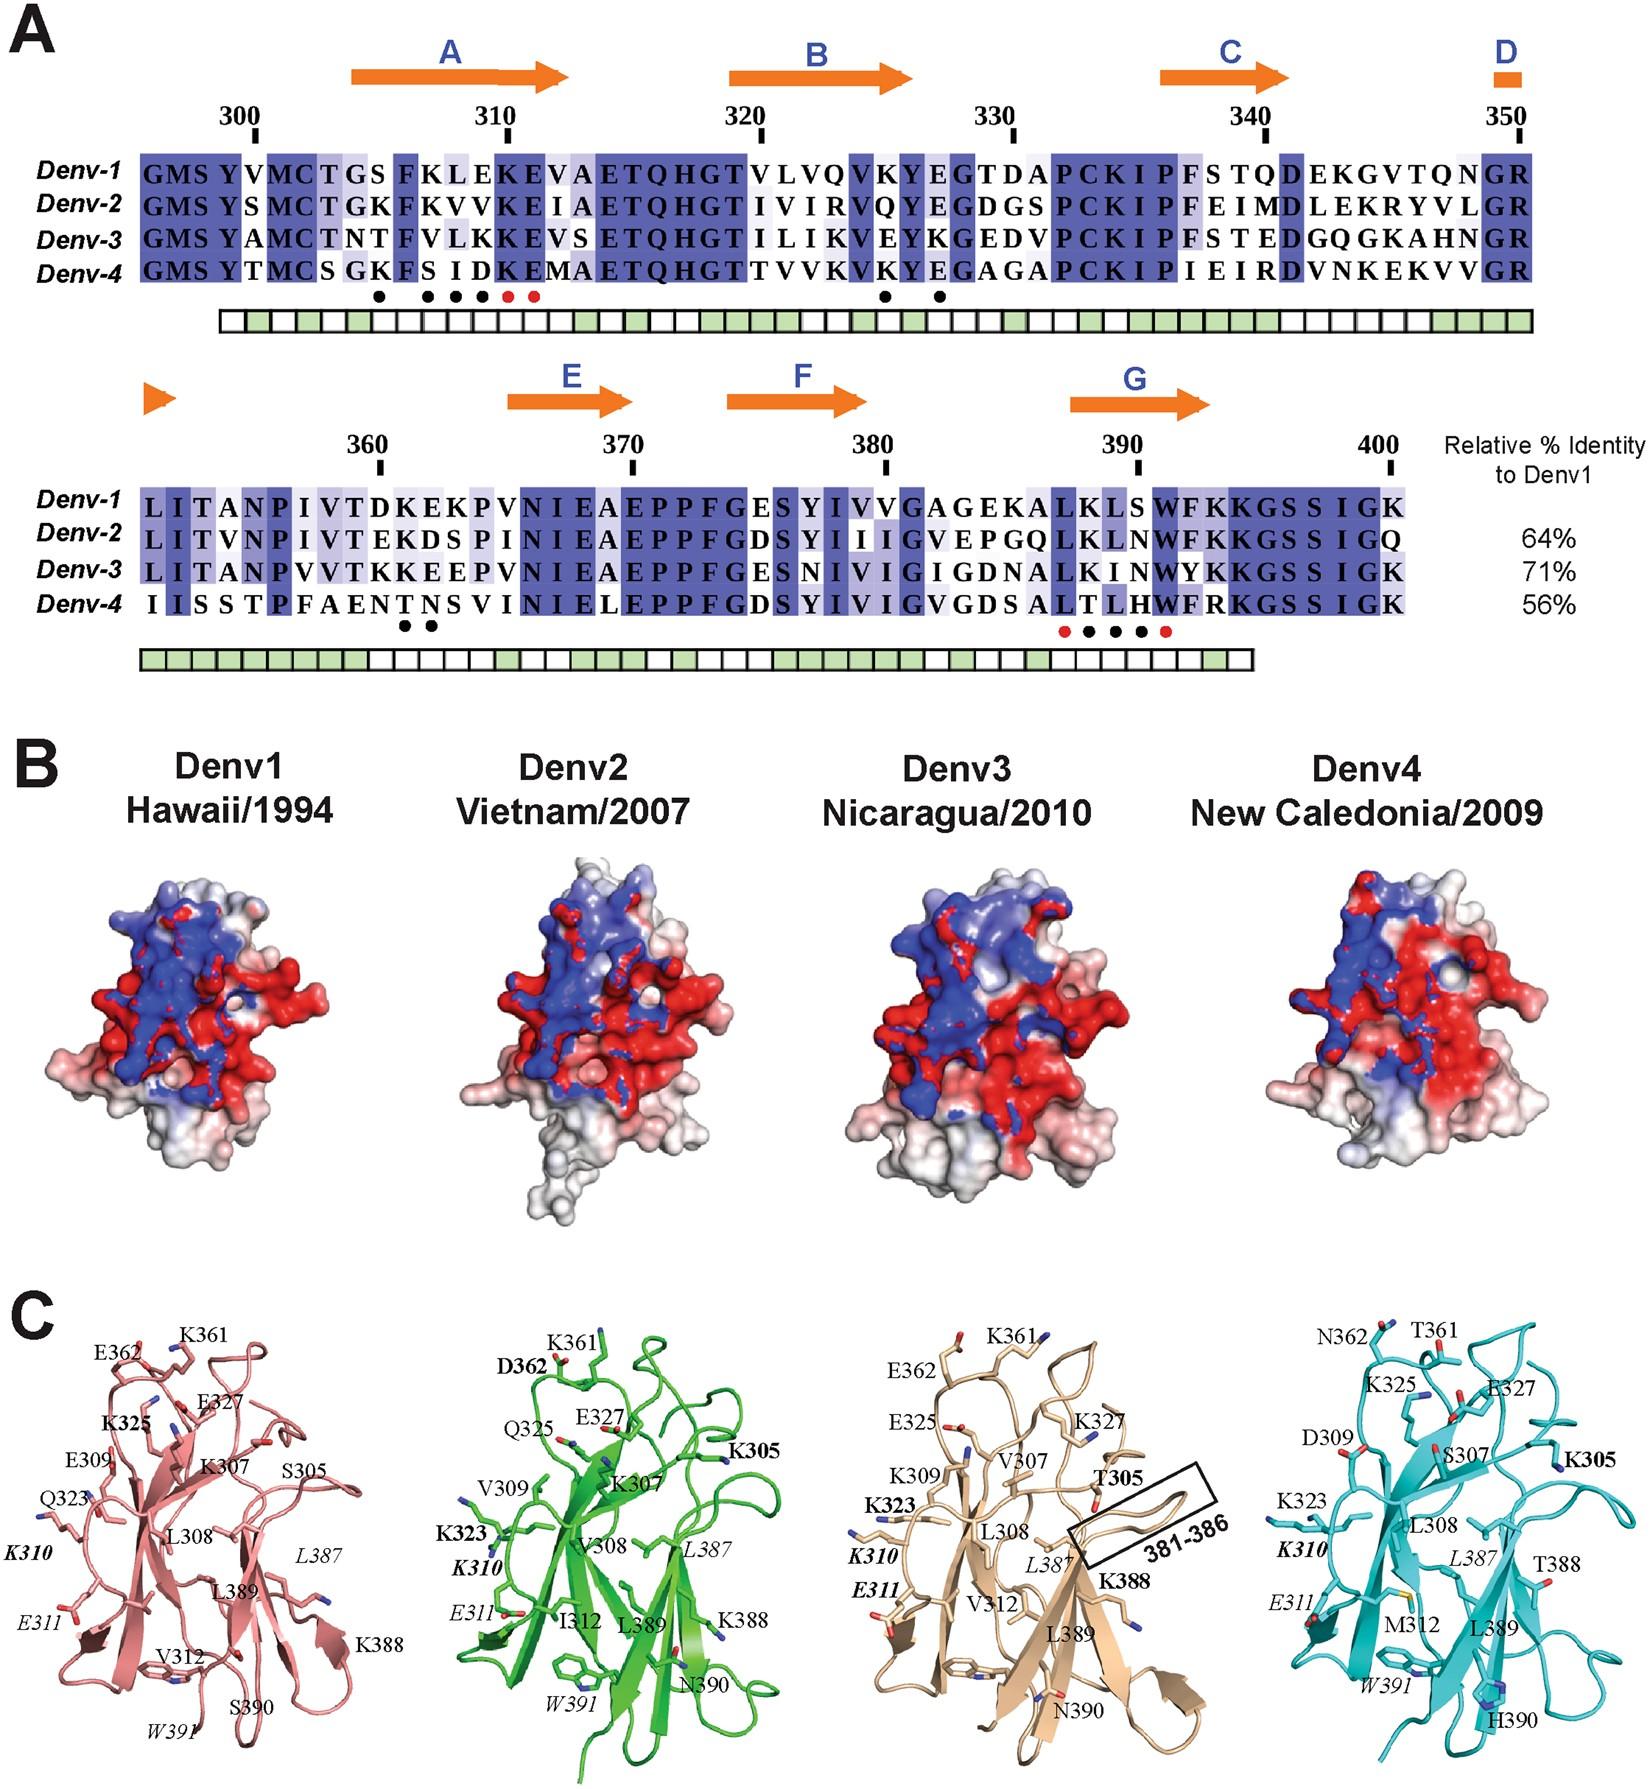 Molecular basis for dengue virus broad cross neutralization by humanized monoclonal antibody 513